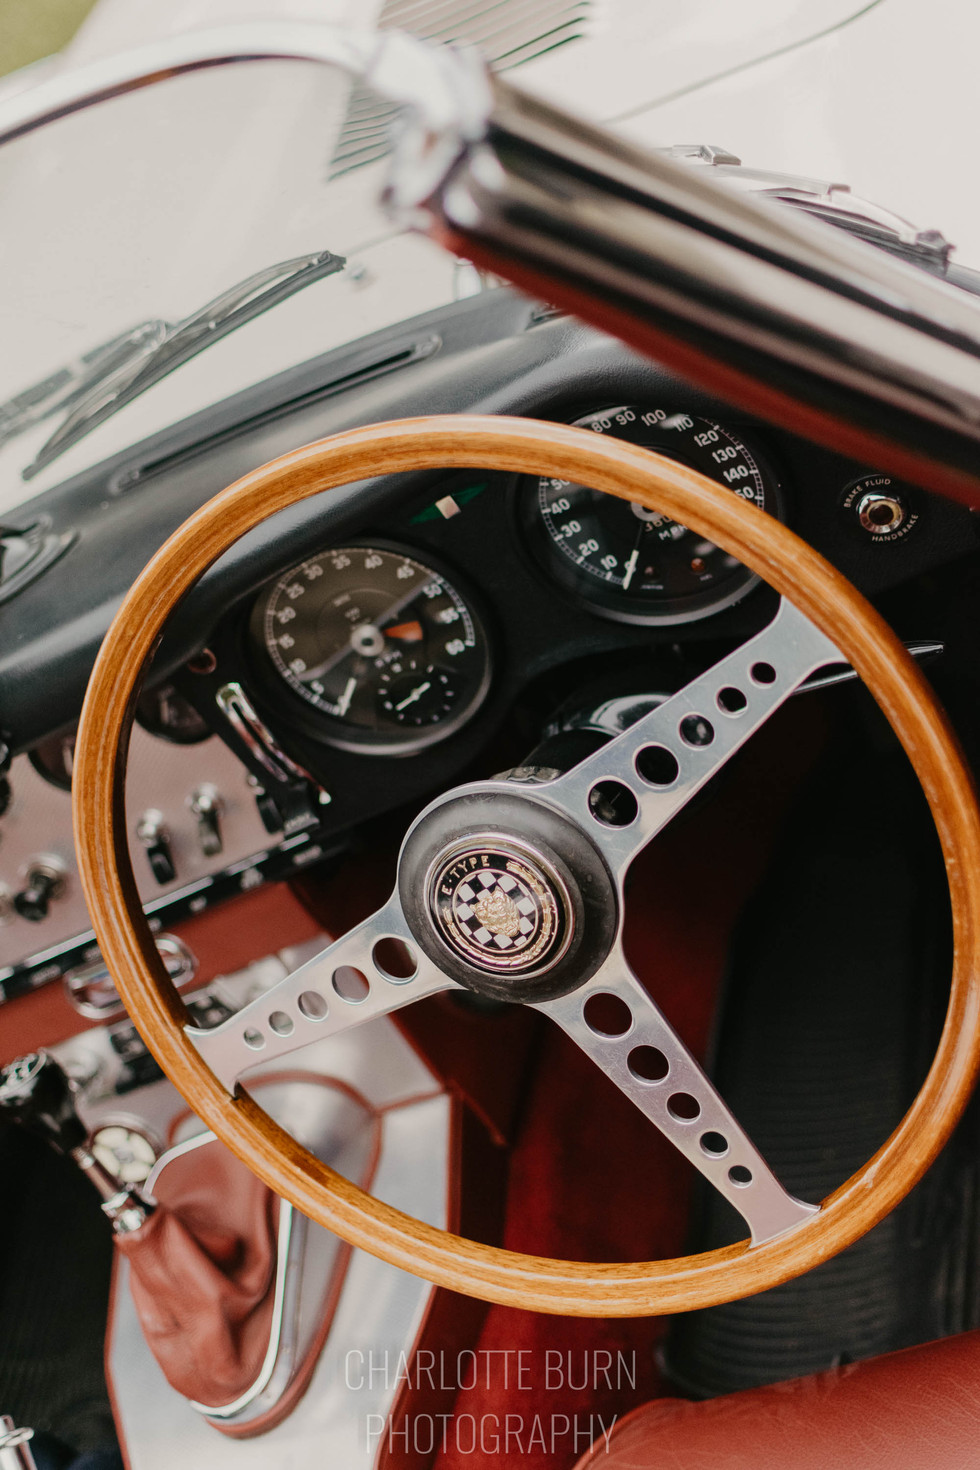 Boradway UK Car Show 2019, Charlotte Burn Photography-11